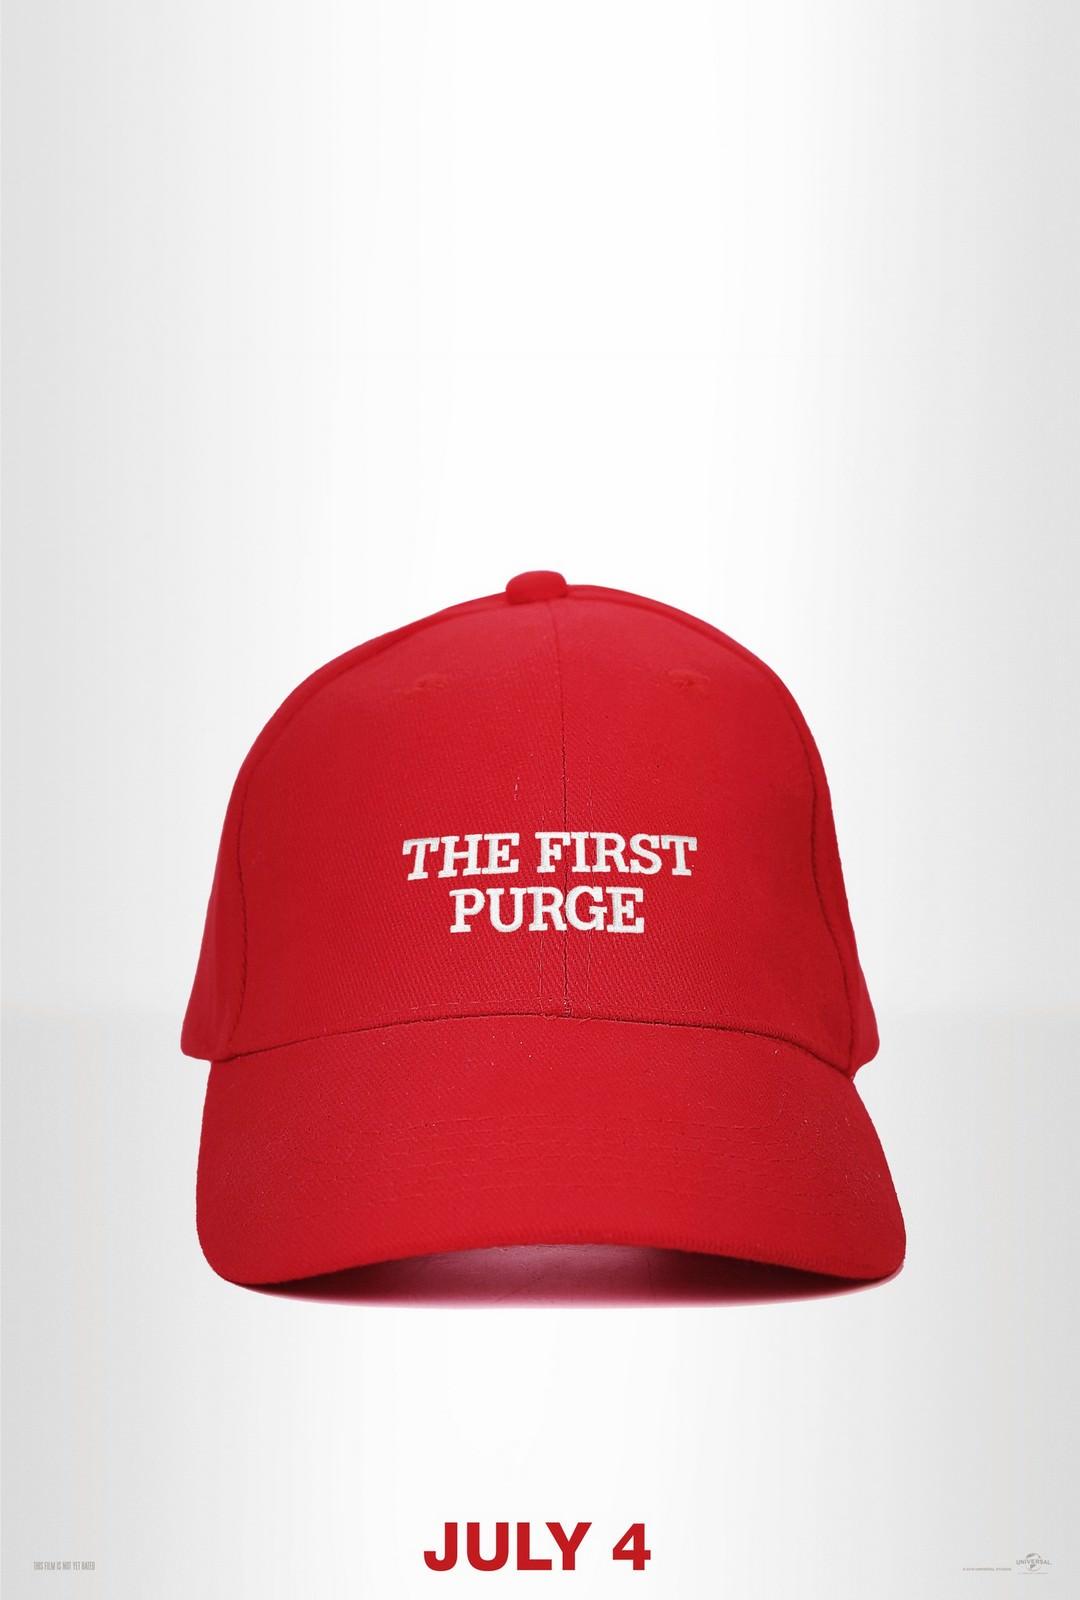 Movie, The First Purge(美國, 2018) / 殺戮元年(台) / 國定殺戮日:屠亡前傳(港) / 人类清除计划4(網), 電影海報, 美國, 前導